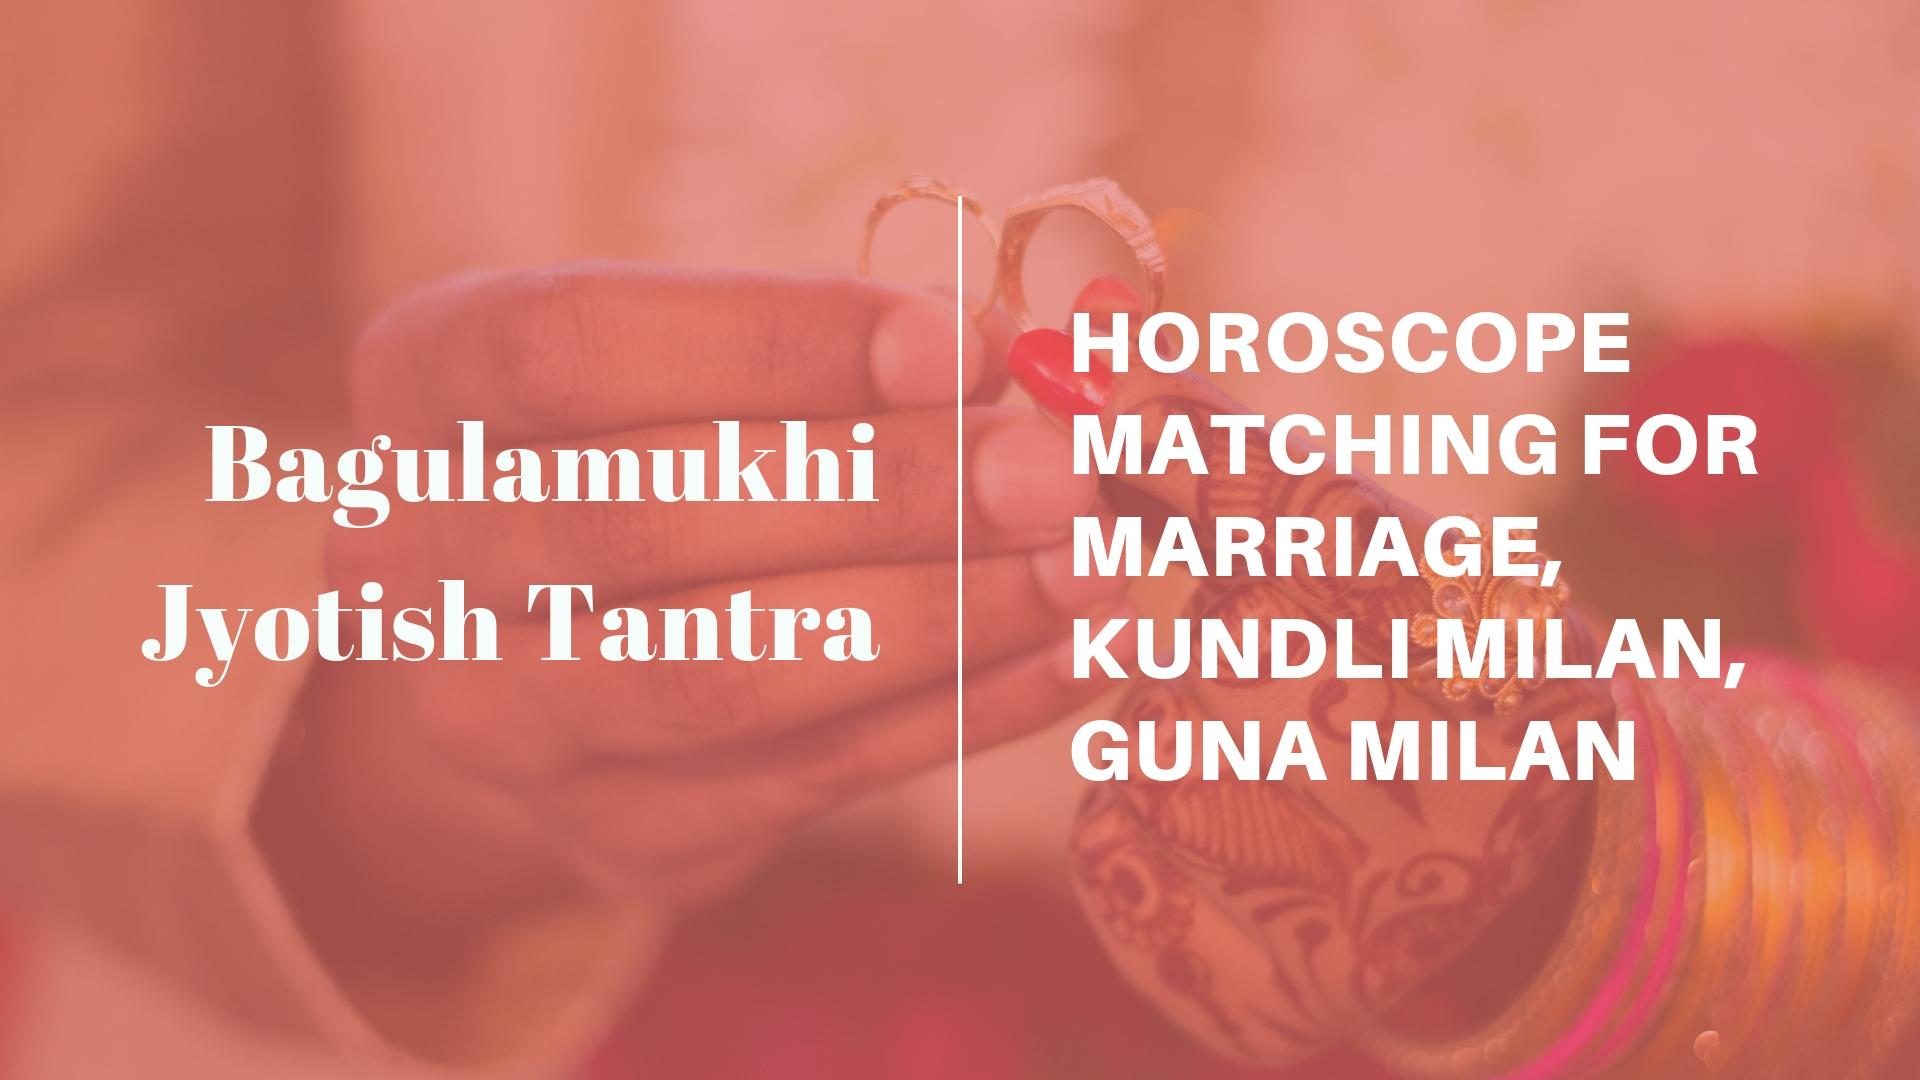 Horoscope Matching for Marriage, Kundli Milan,